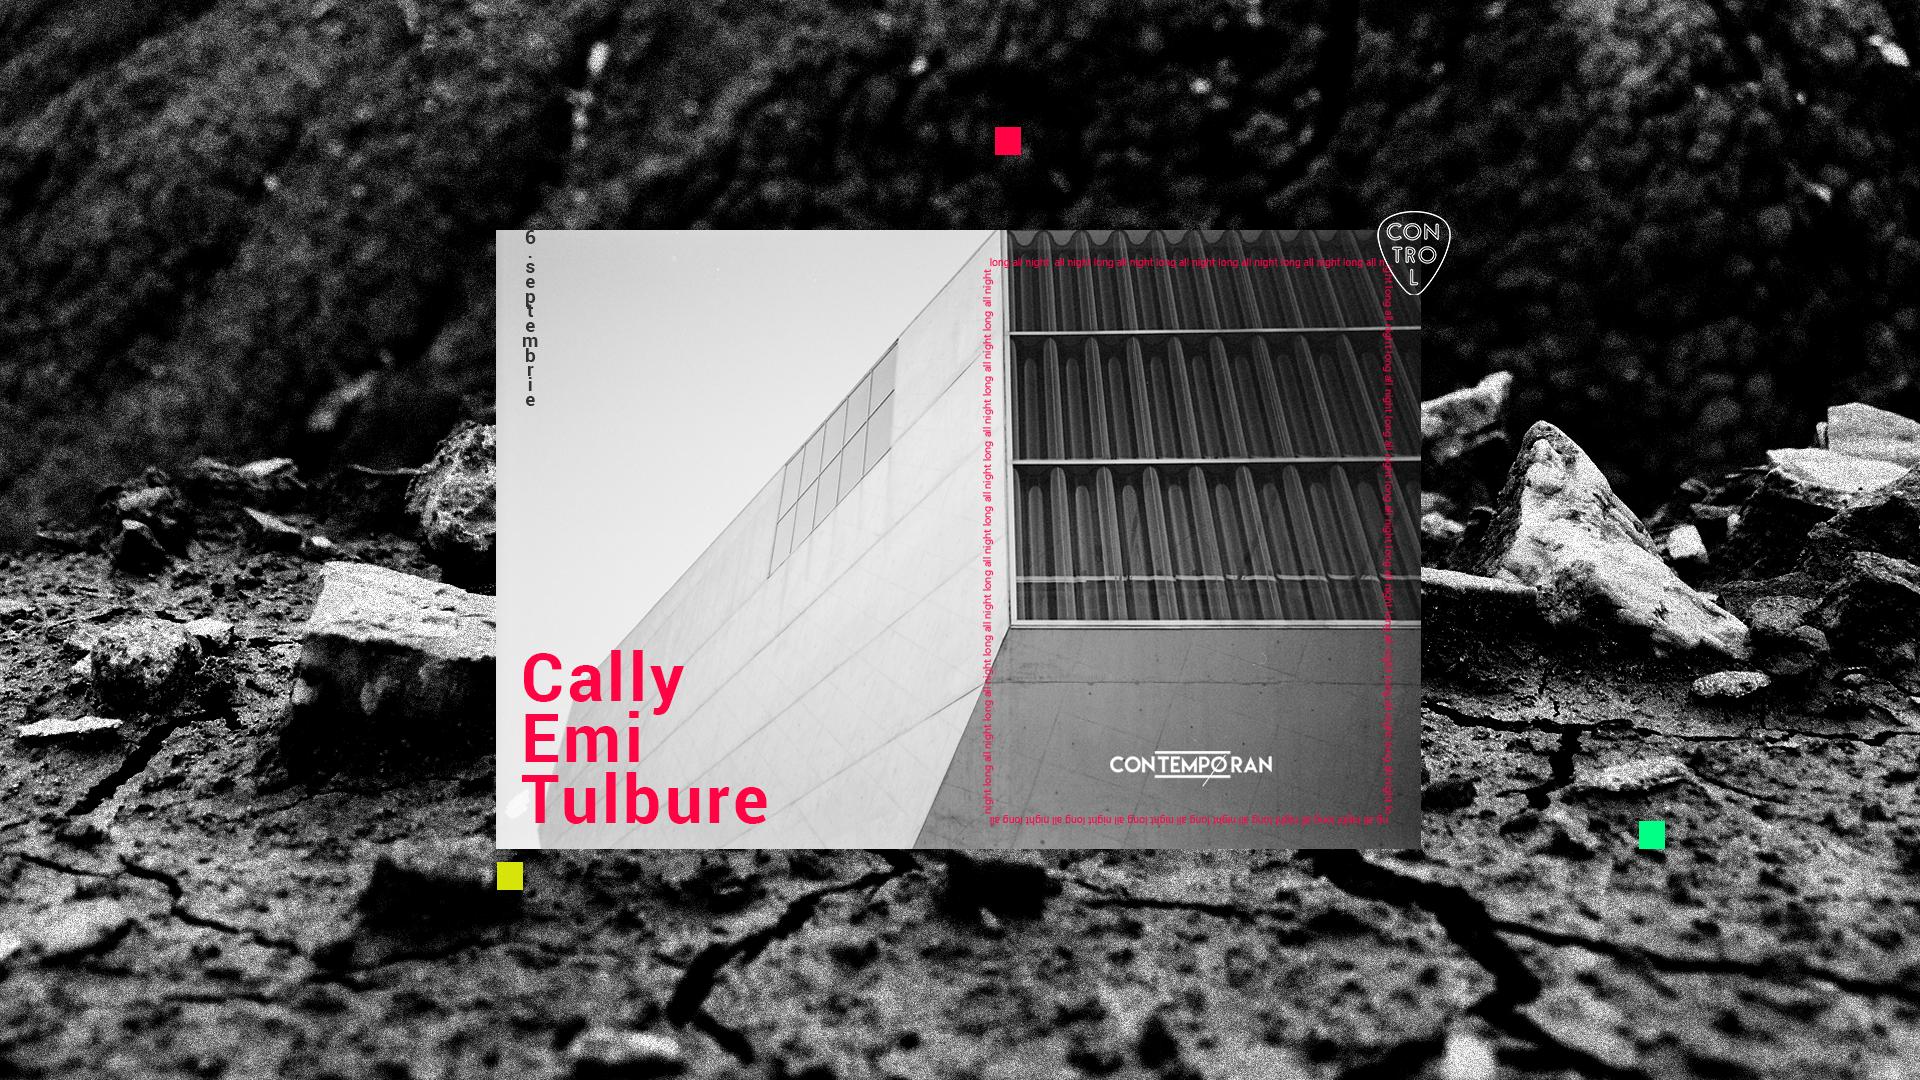 14_emi_tulbure_cally